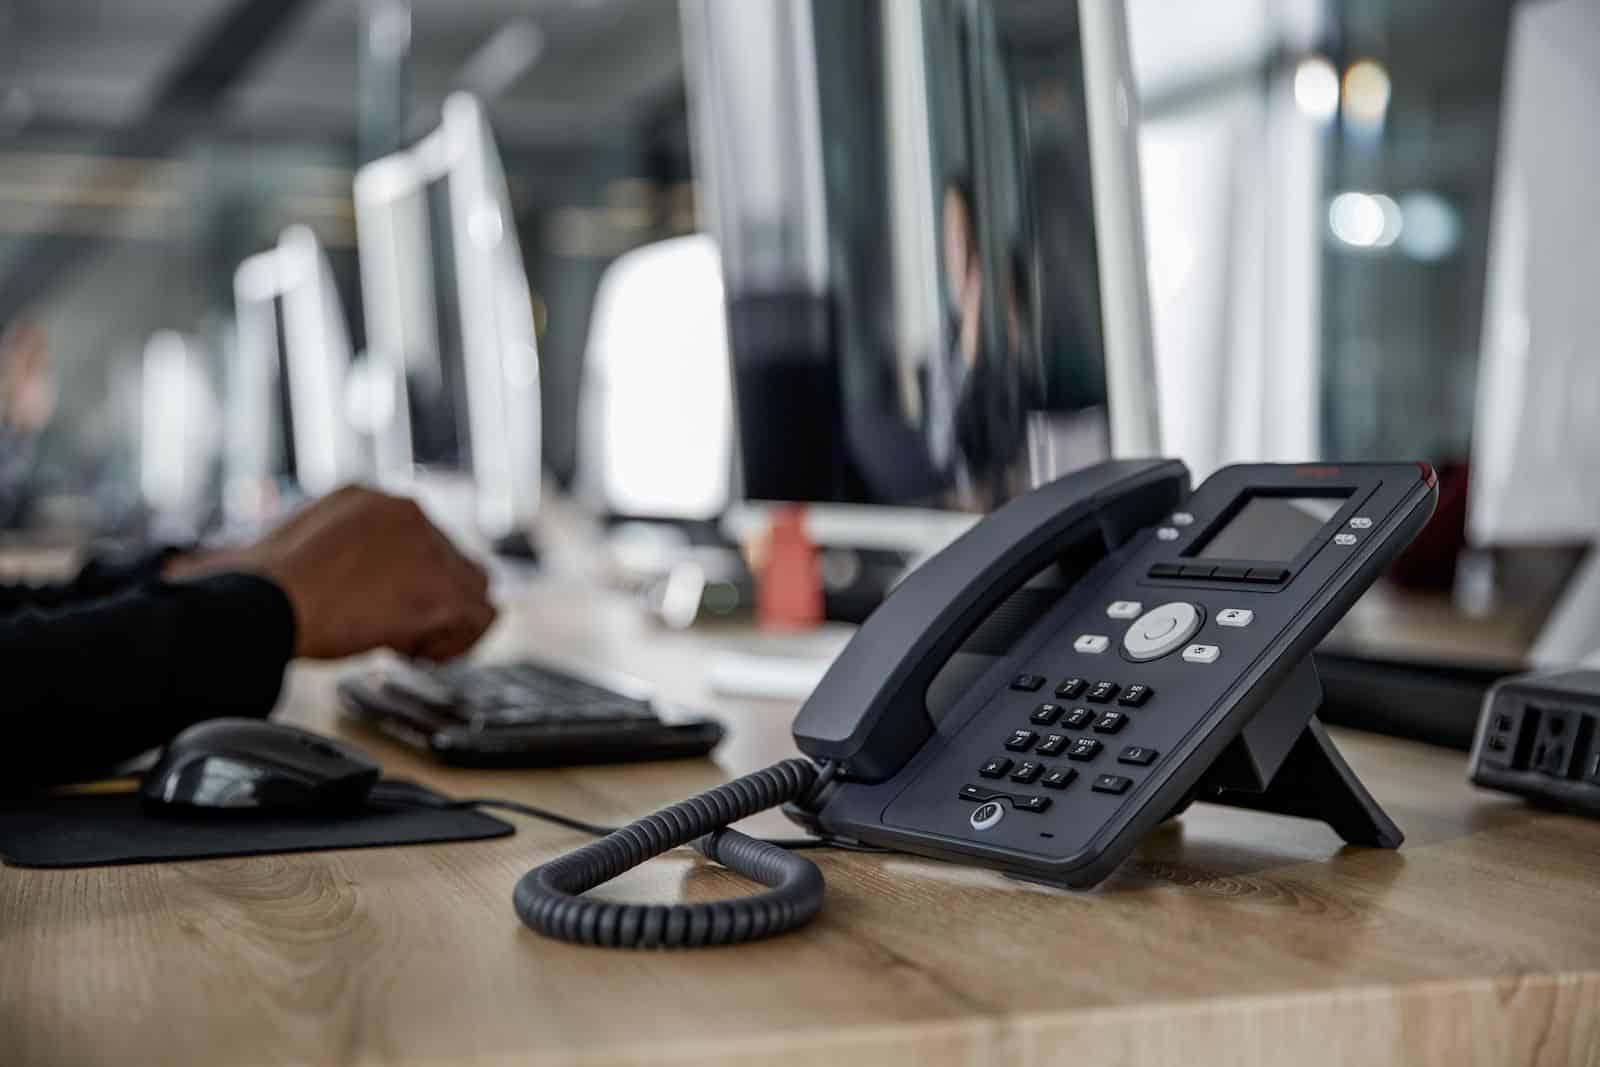 Avaya business telephone